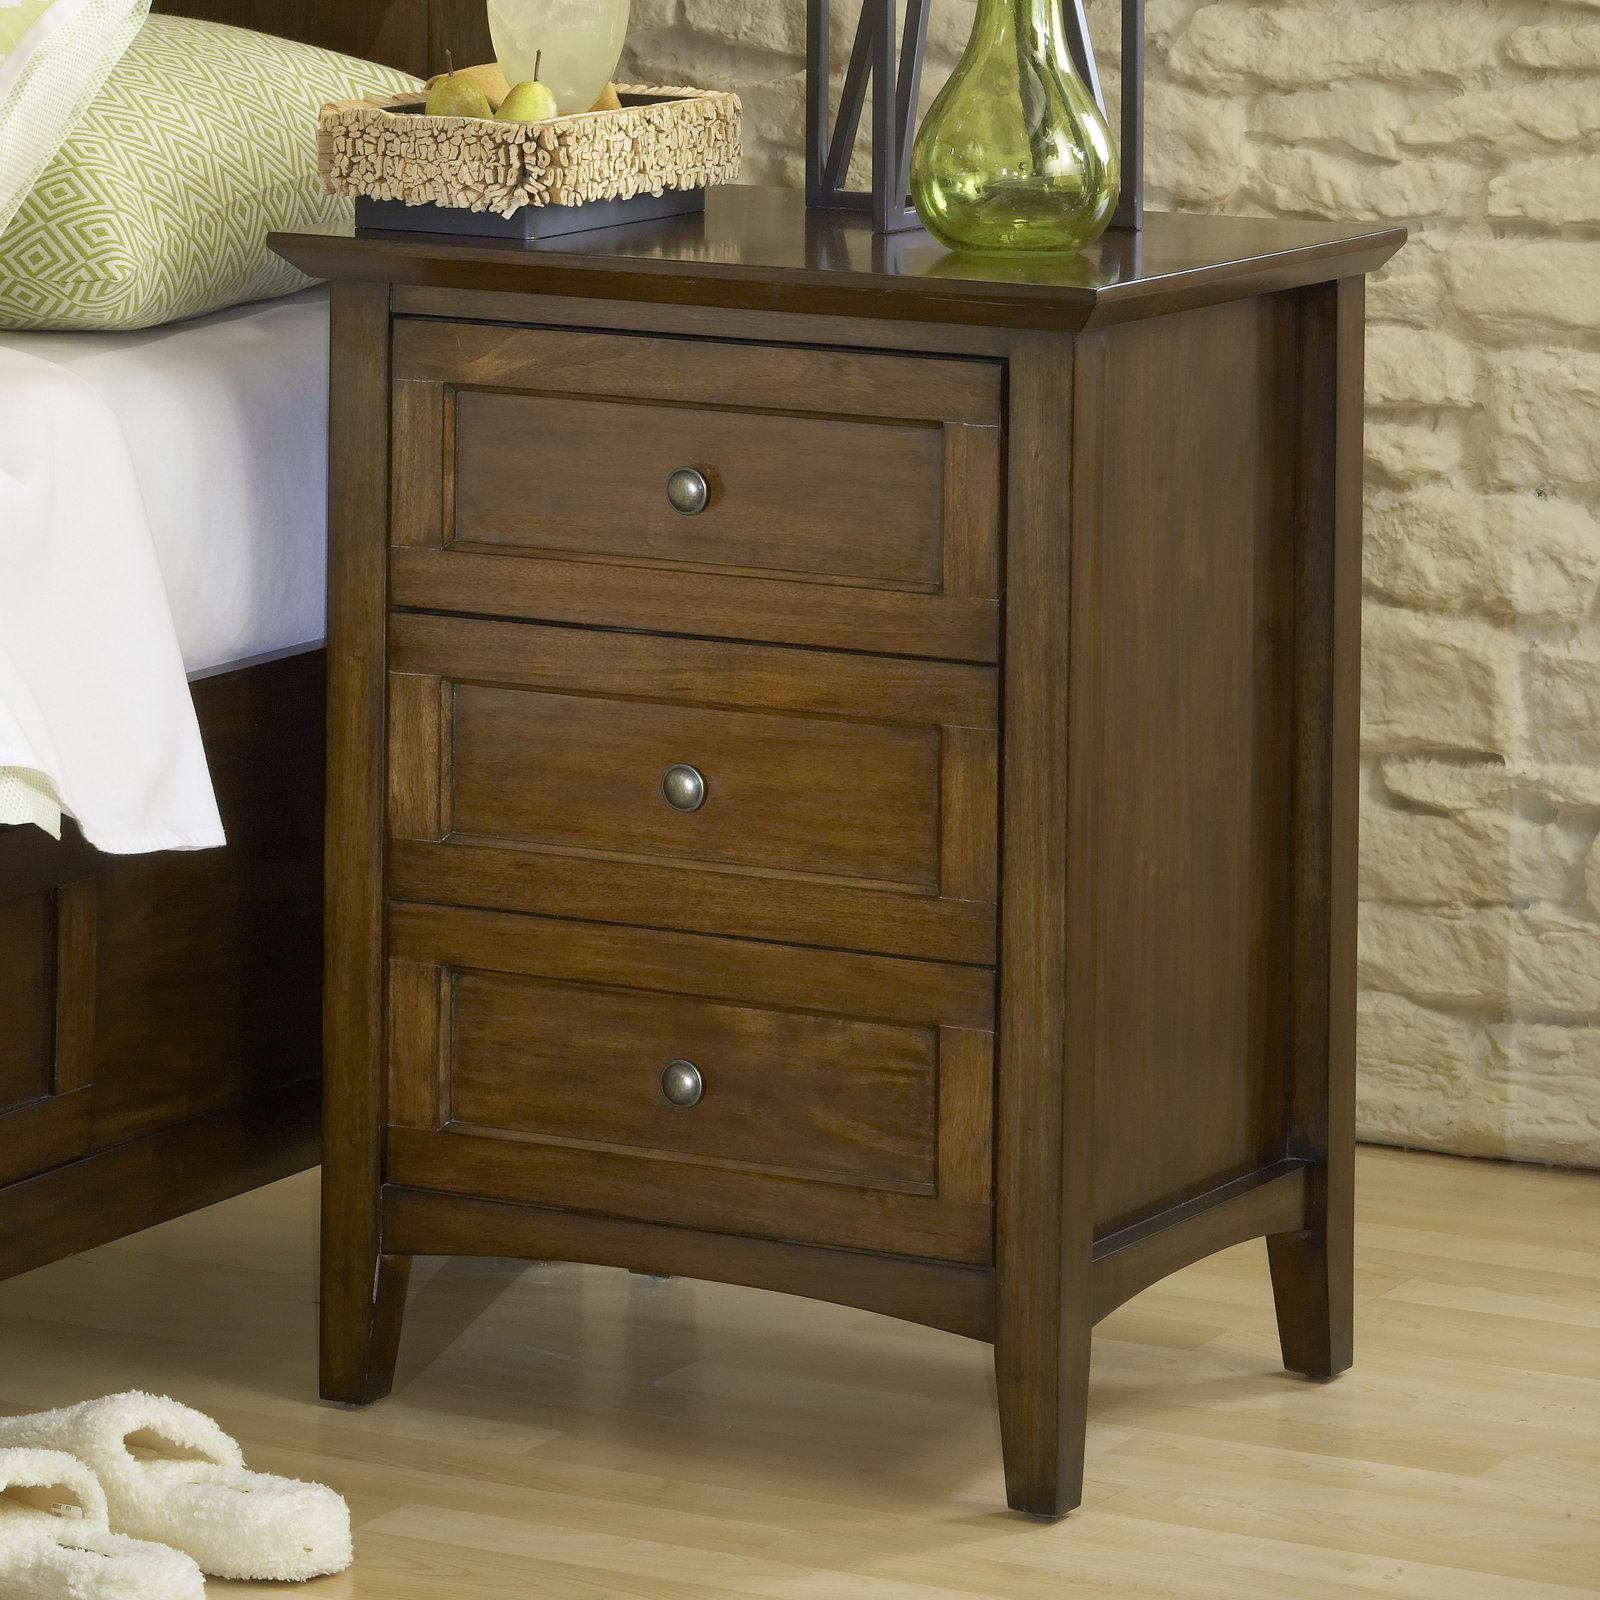 Modus Paragon 3 Drawer Nightstand by Modus Furniture International